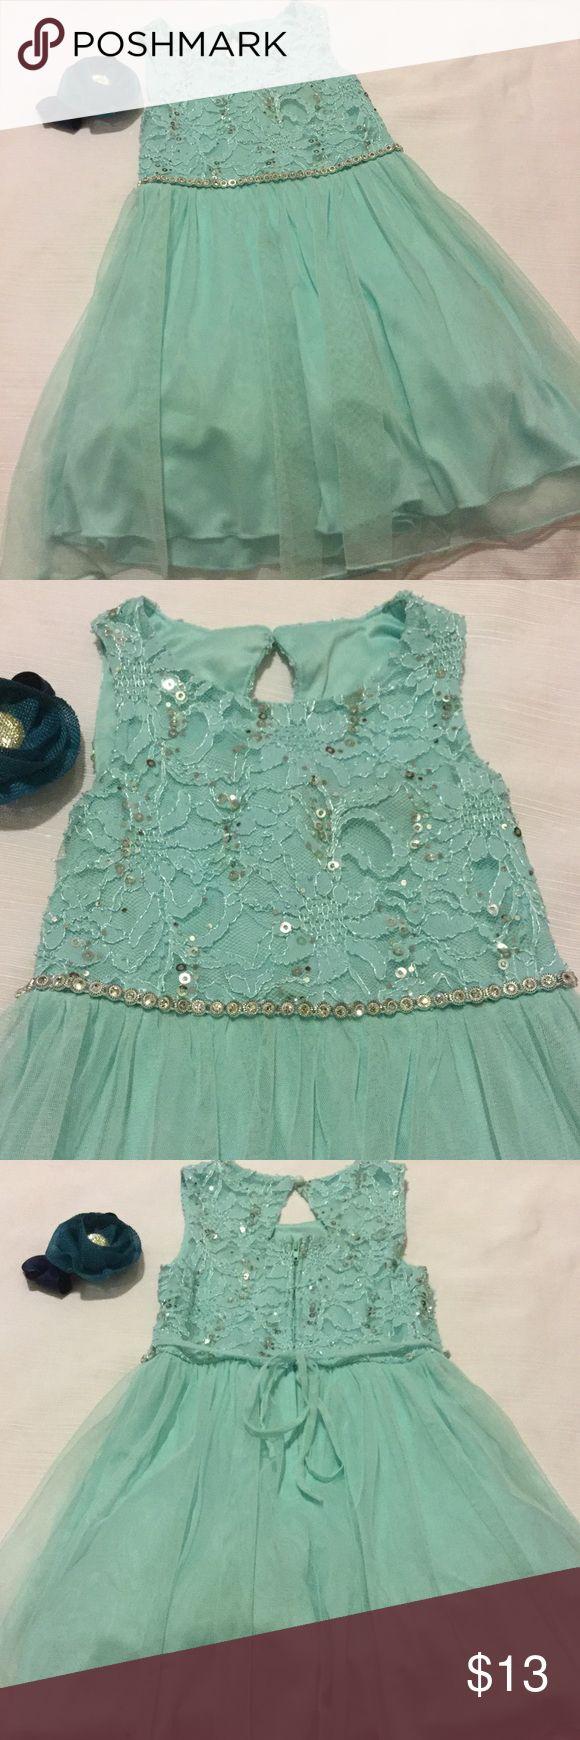 🌺Xtraordinary lovely dress size 4 girls EUC Xtraordinary lovely dress size 4 girls aqua color dress no tears Xtraordinary Dresses Casual